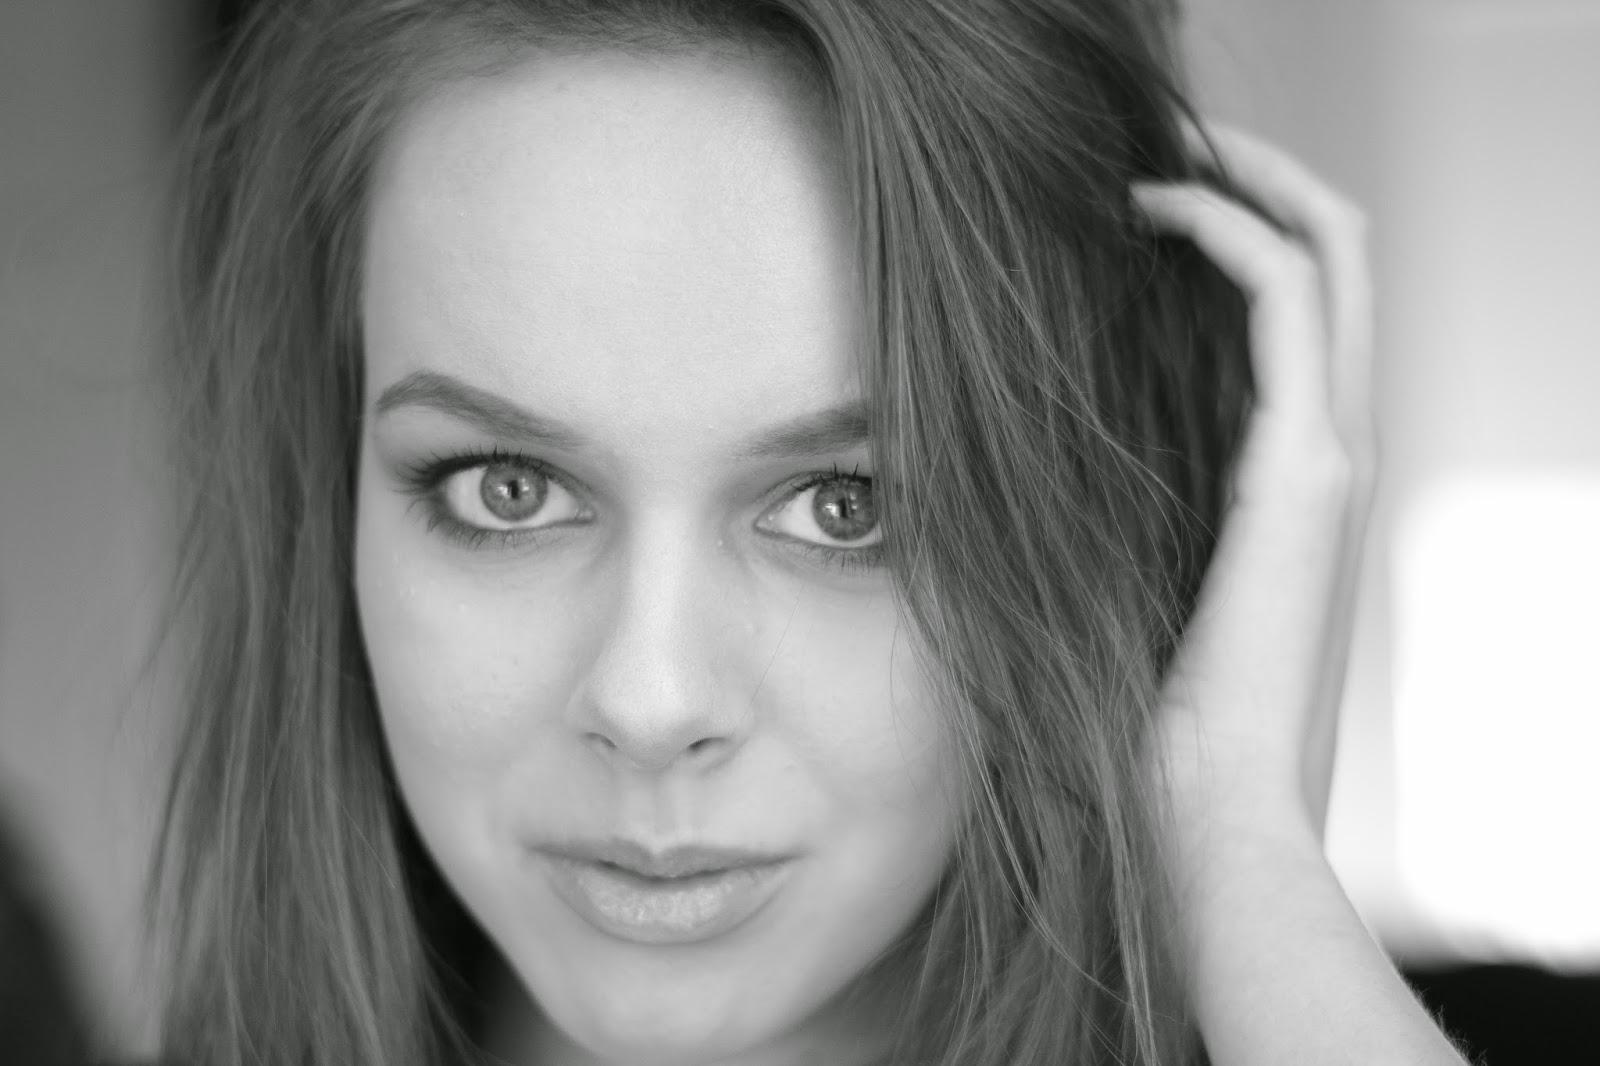 portretfotografie beautyblog